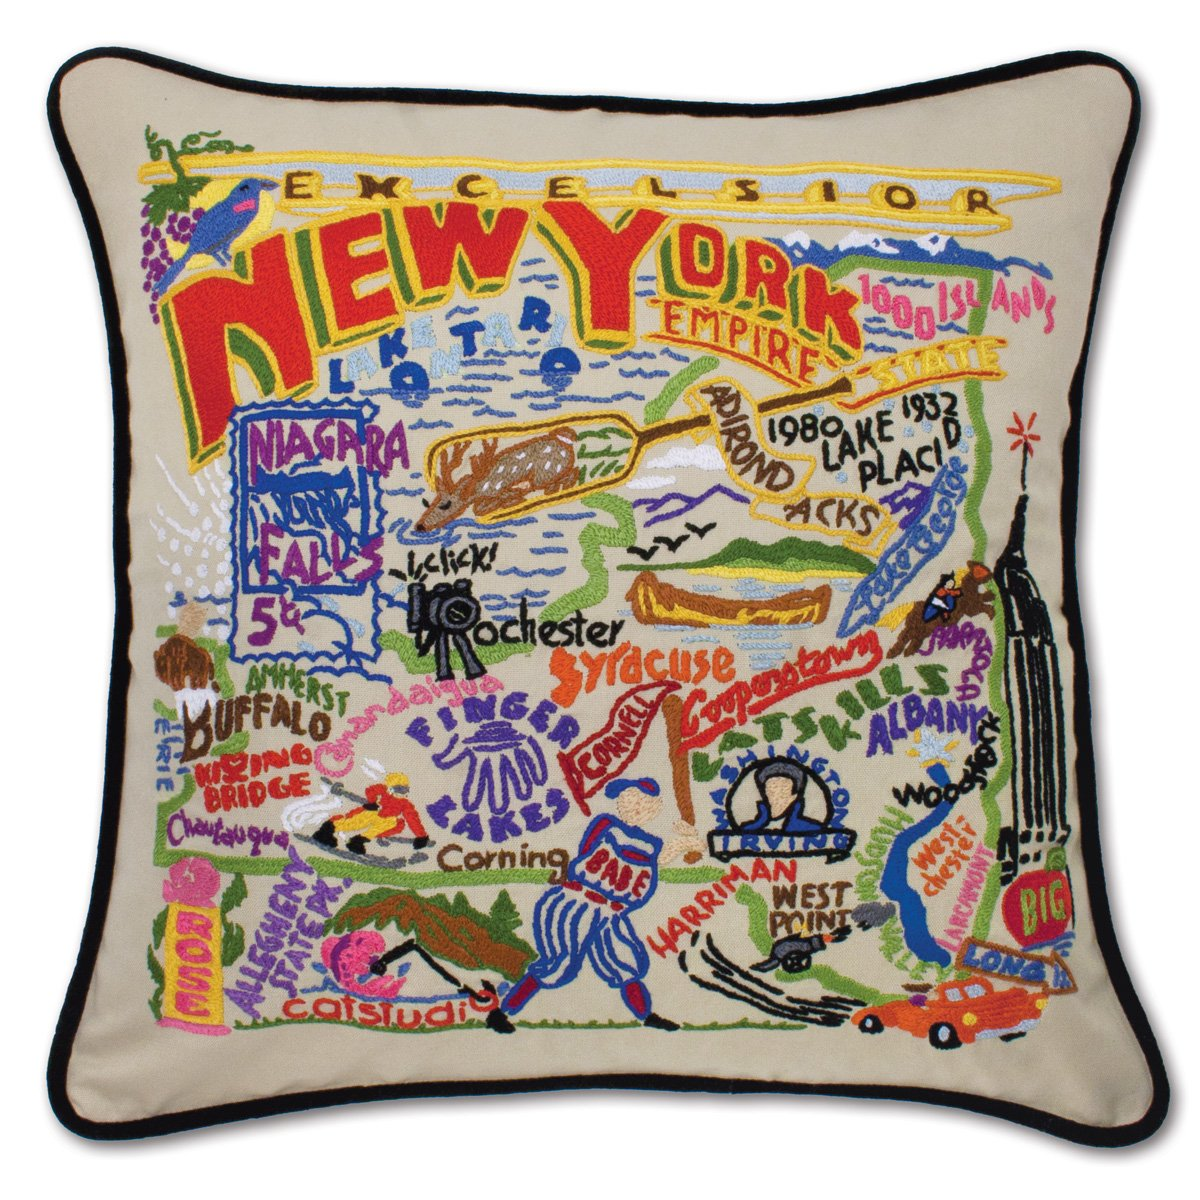 NEW YORK HAND EMBROIDERED PILLOW - CATSTUDIO